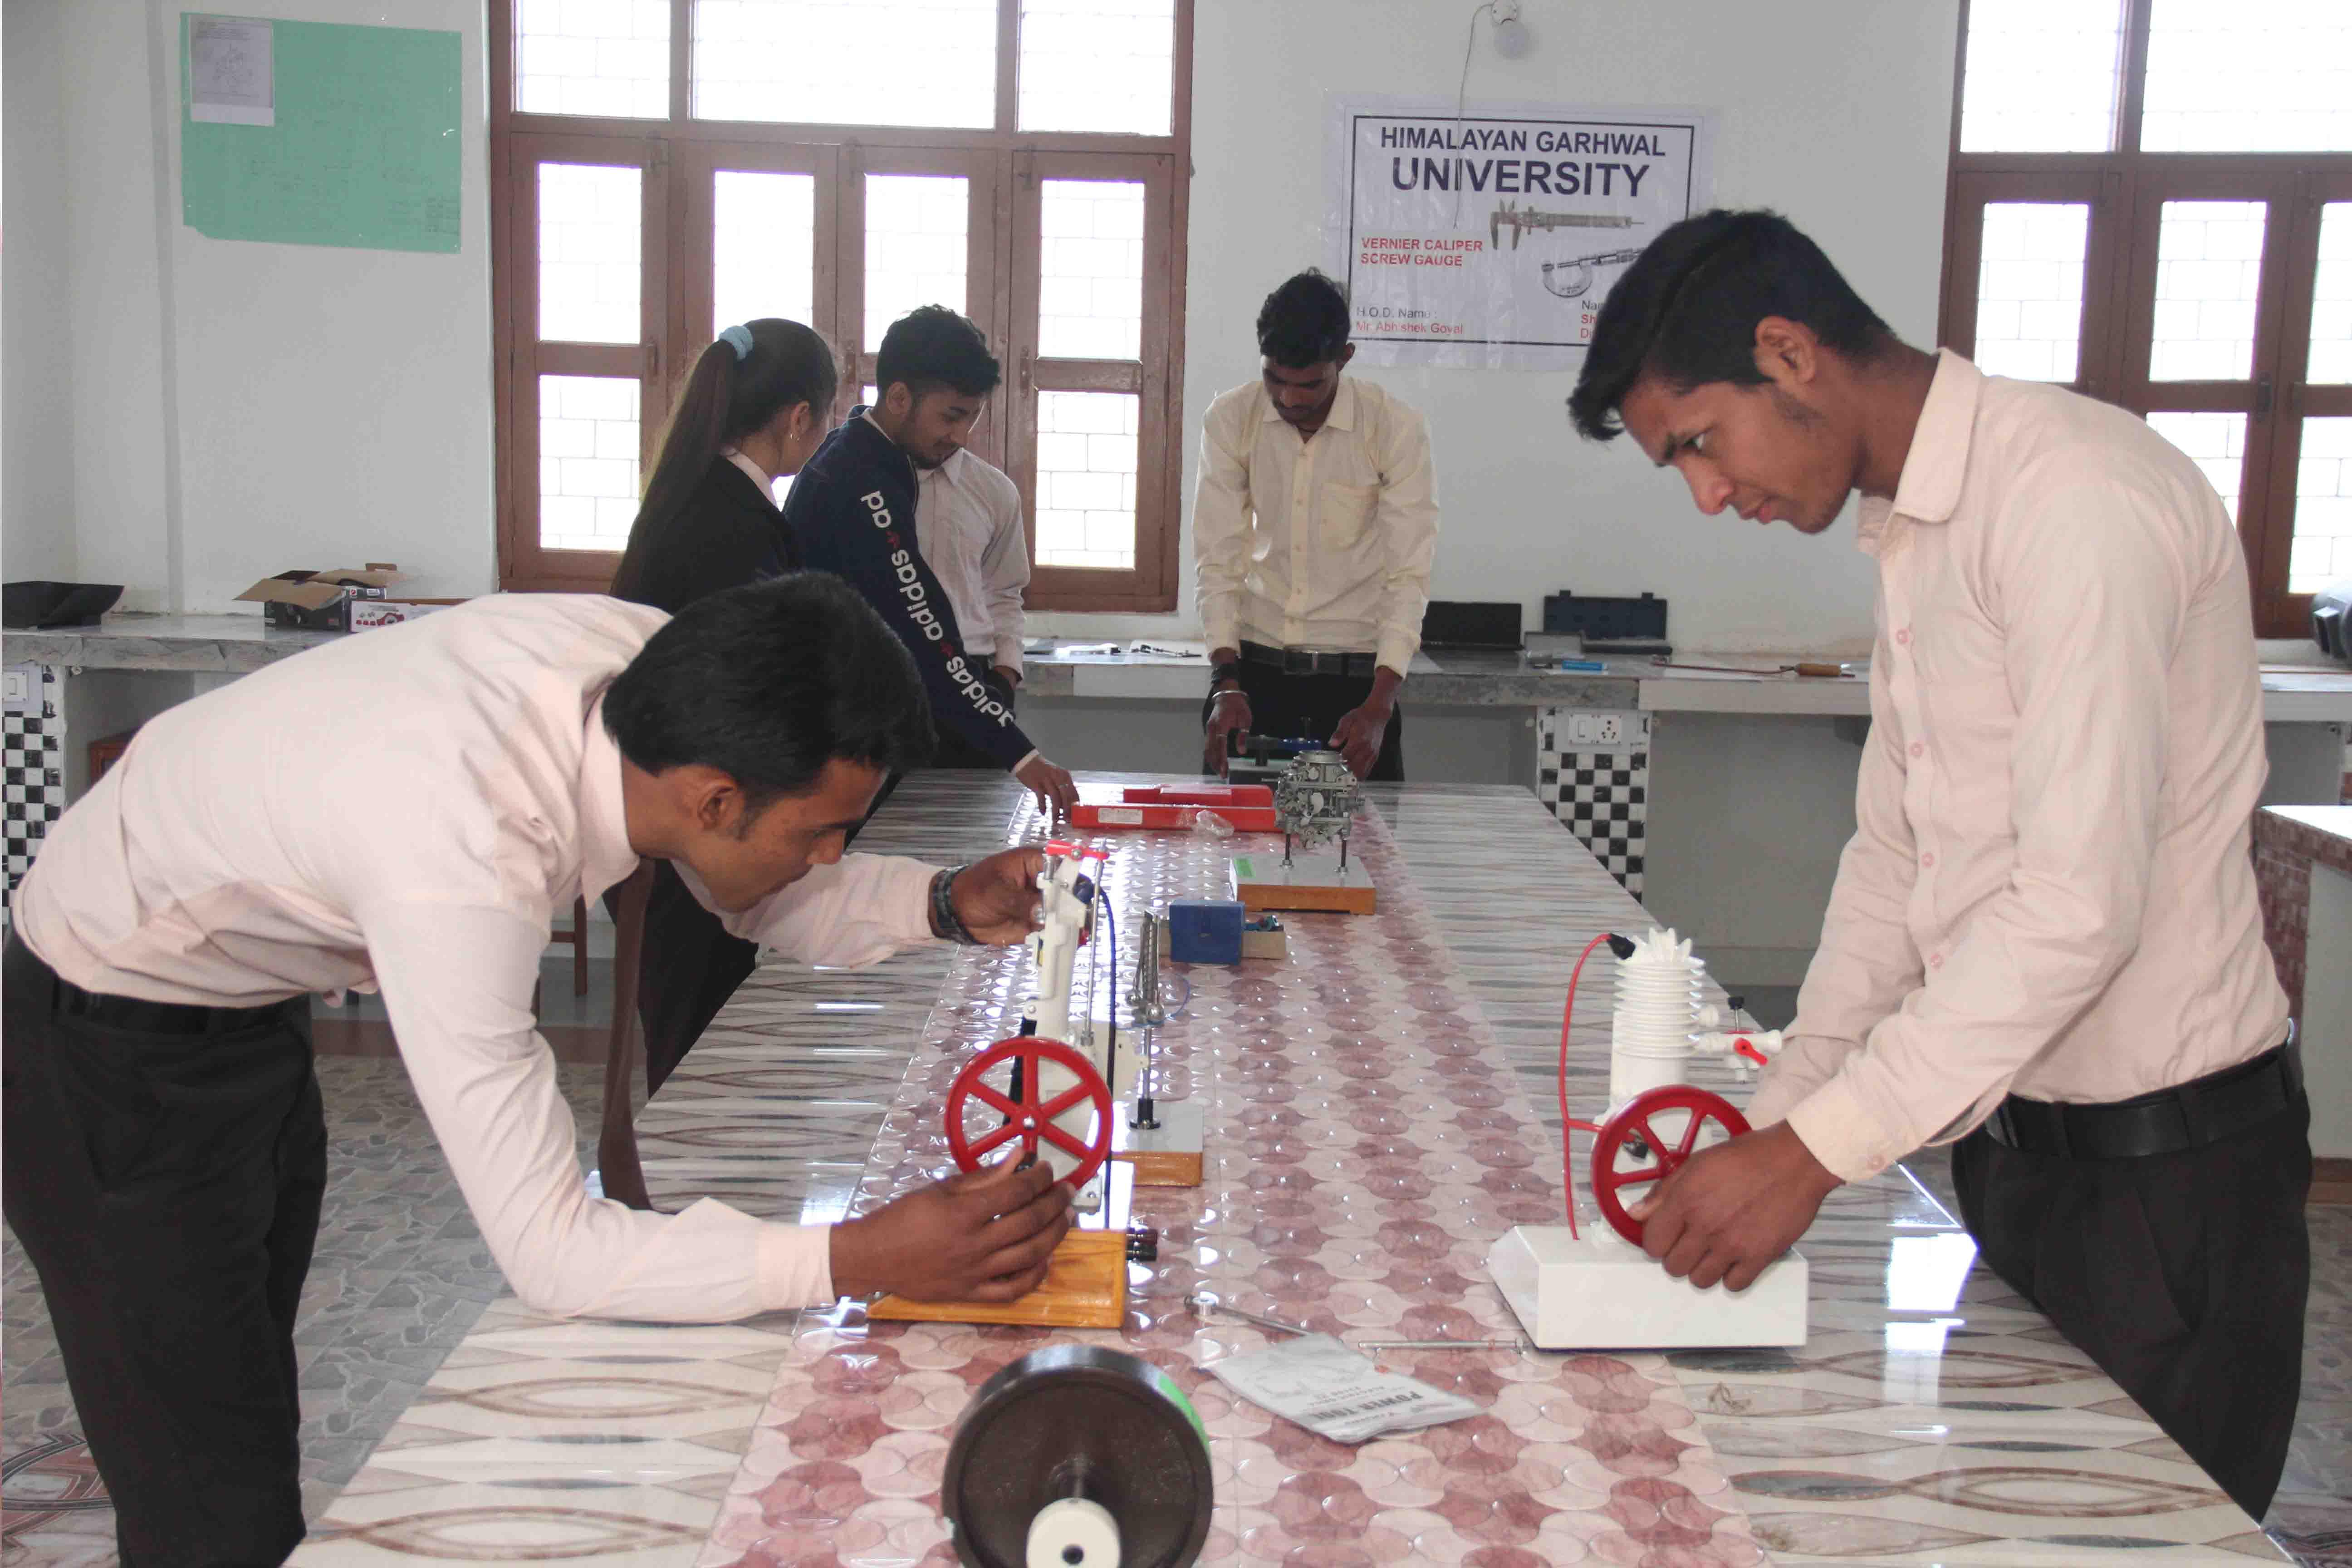 Prof. N K Sinha, Vice-Chancellor, Himalayan Garhwal University at University Campus